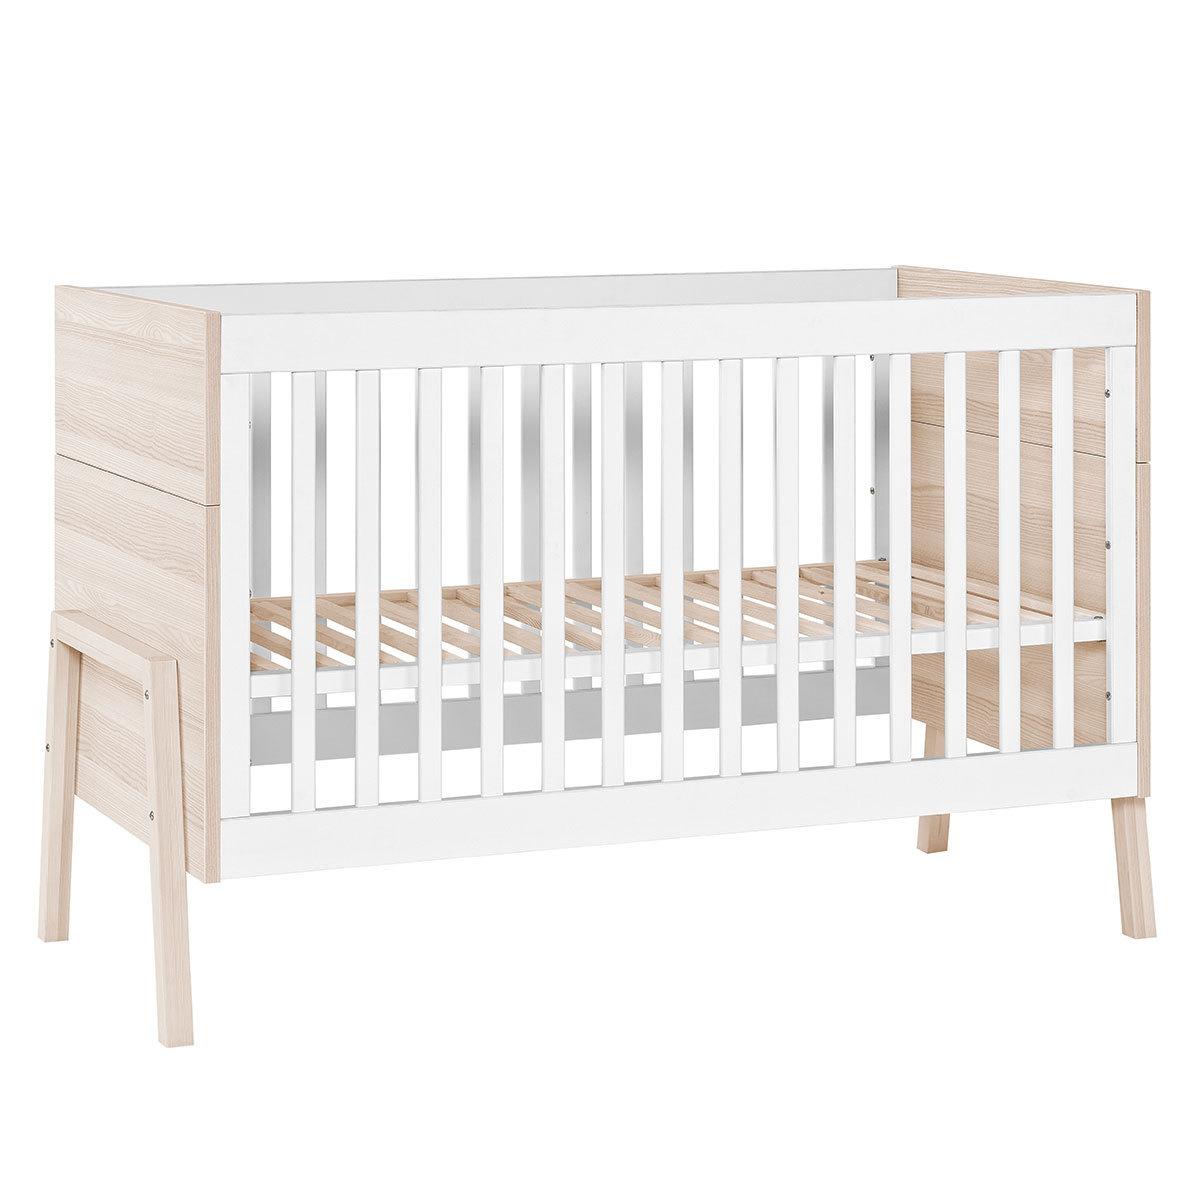 Lit bébé Lit Bébé Spot Blanc - 60 x 120 cm